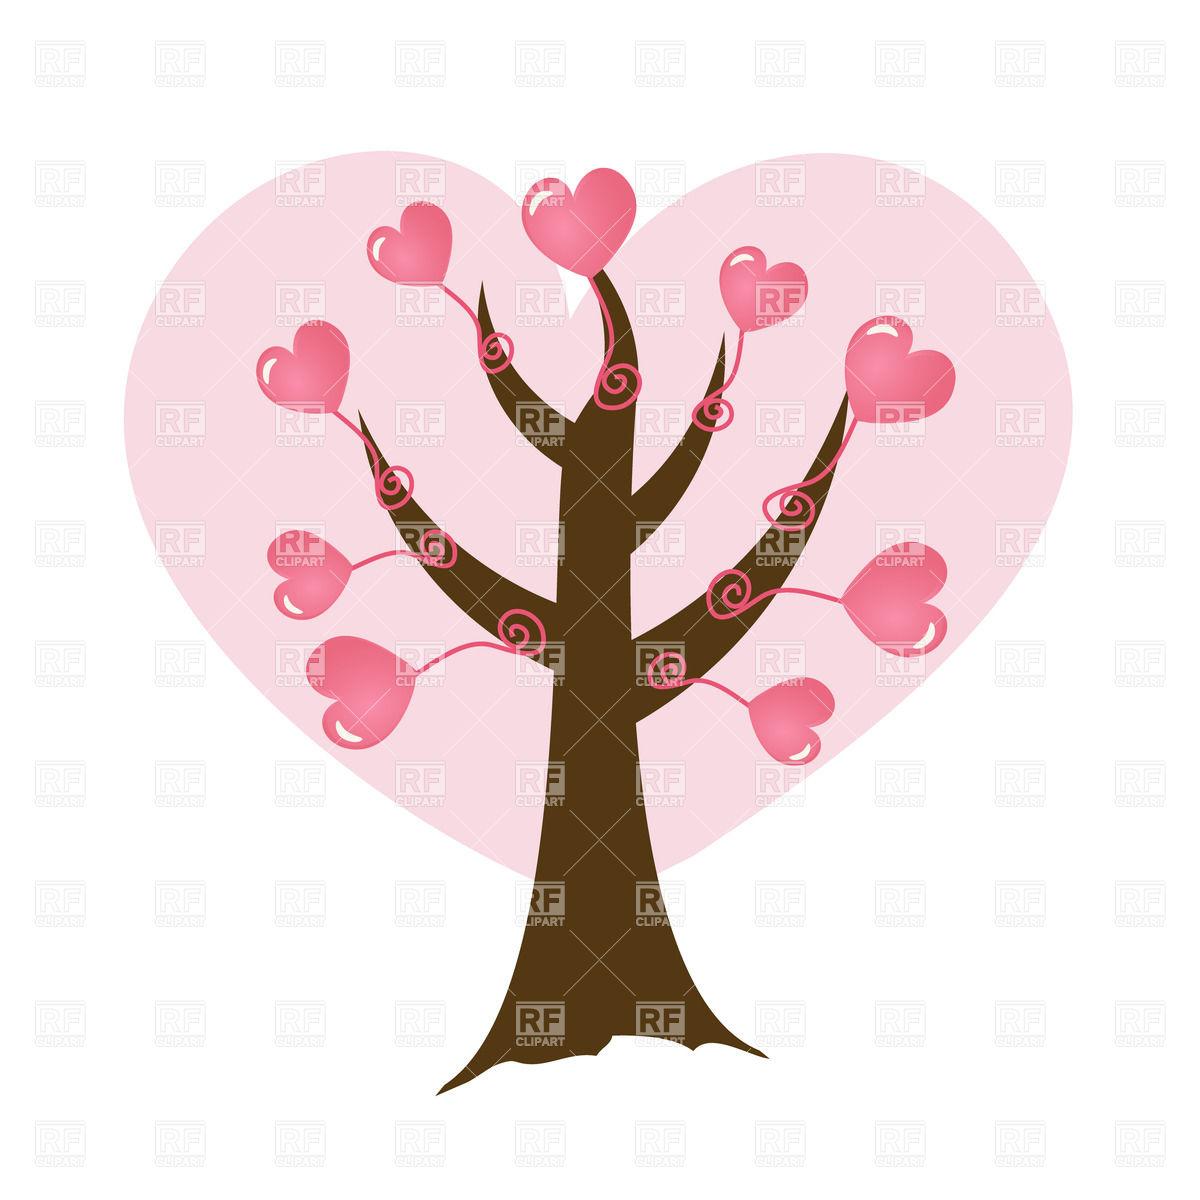 1200x1200 Abstract Cartoon Tree With Heart Look Foliage Royalty Free Vector